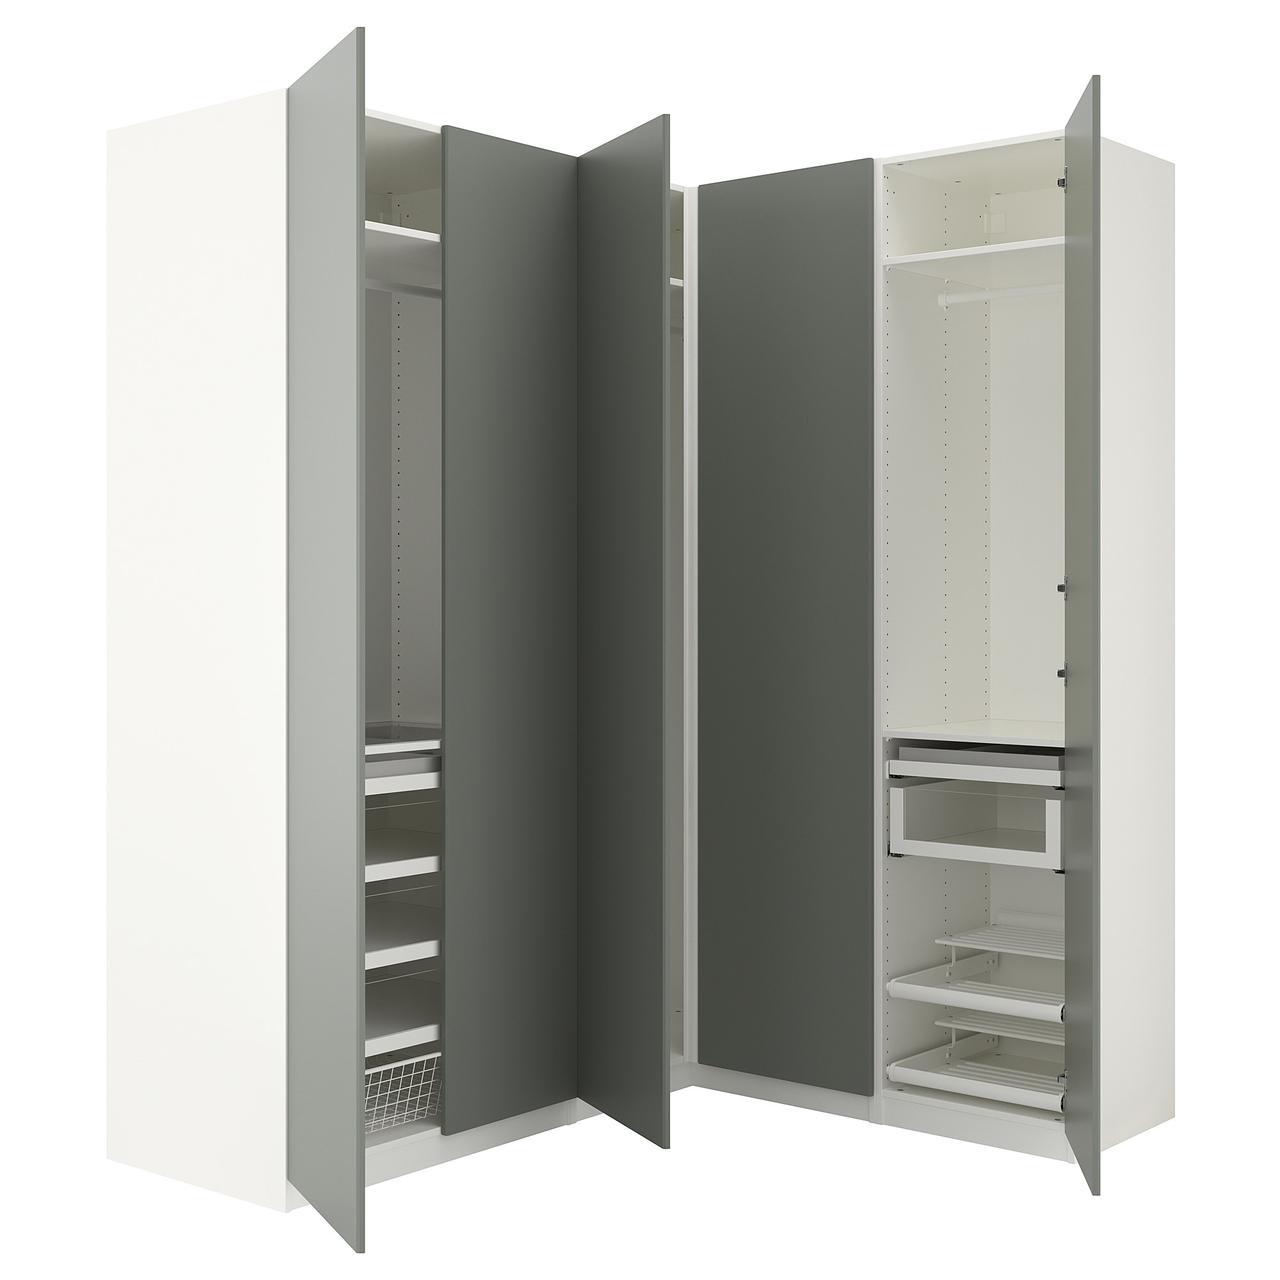 Угловой шкаф IKEA PAX 210/160x236 см Reinsvoll белый серо-зеленый 292.656.79